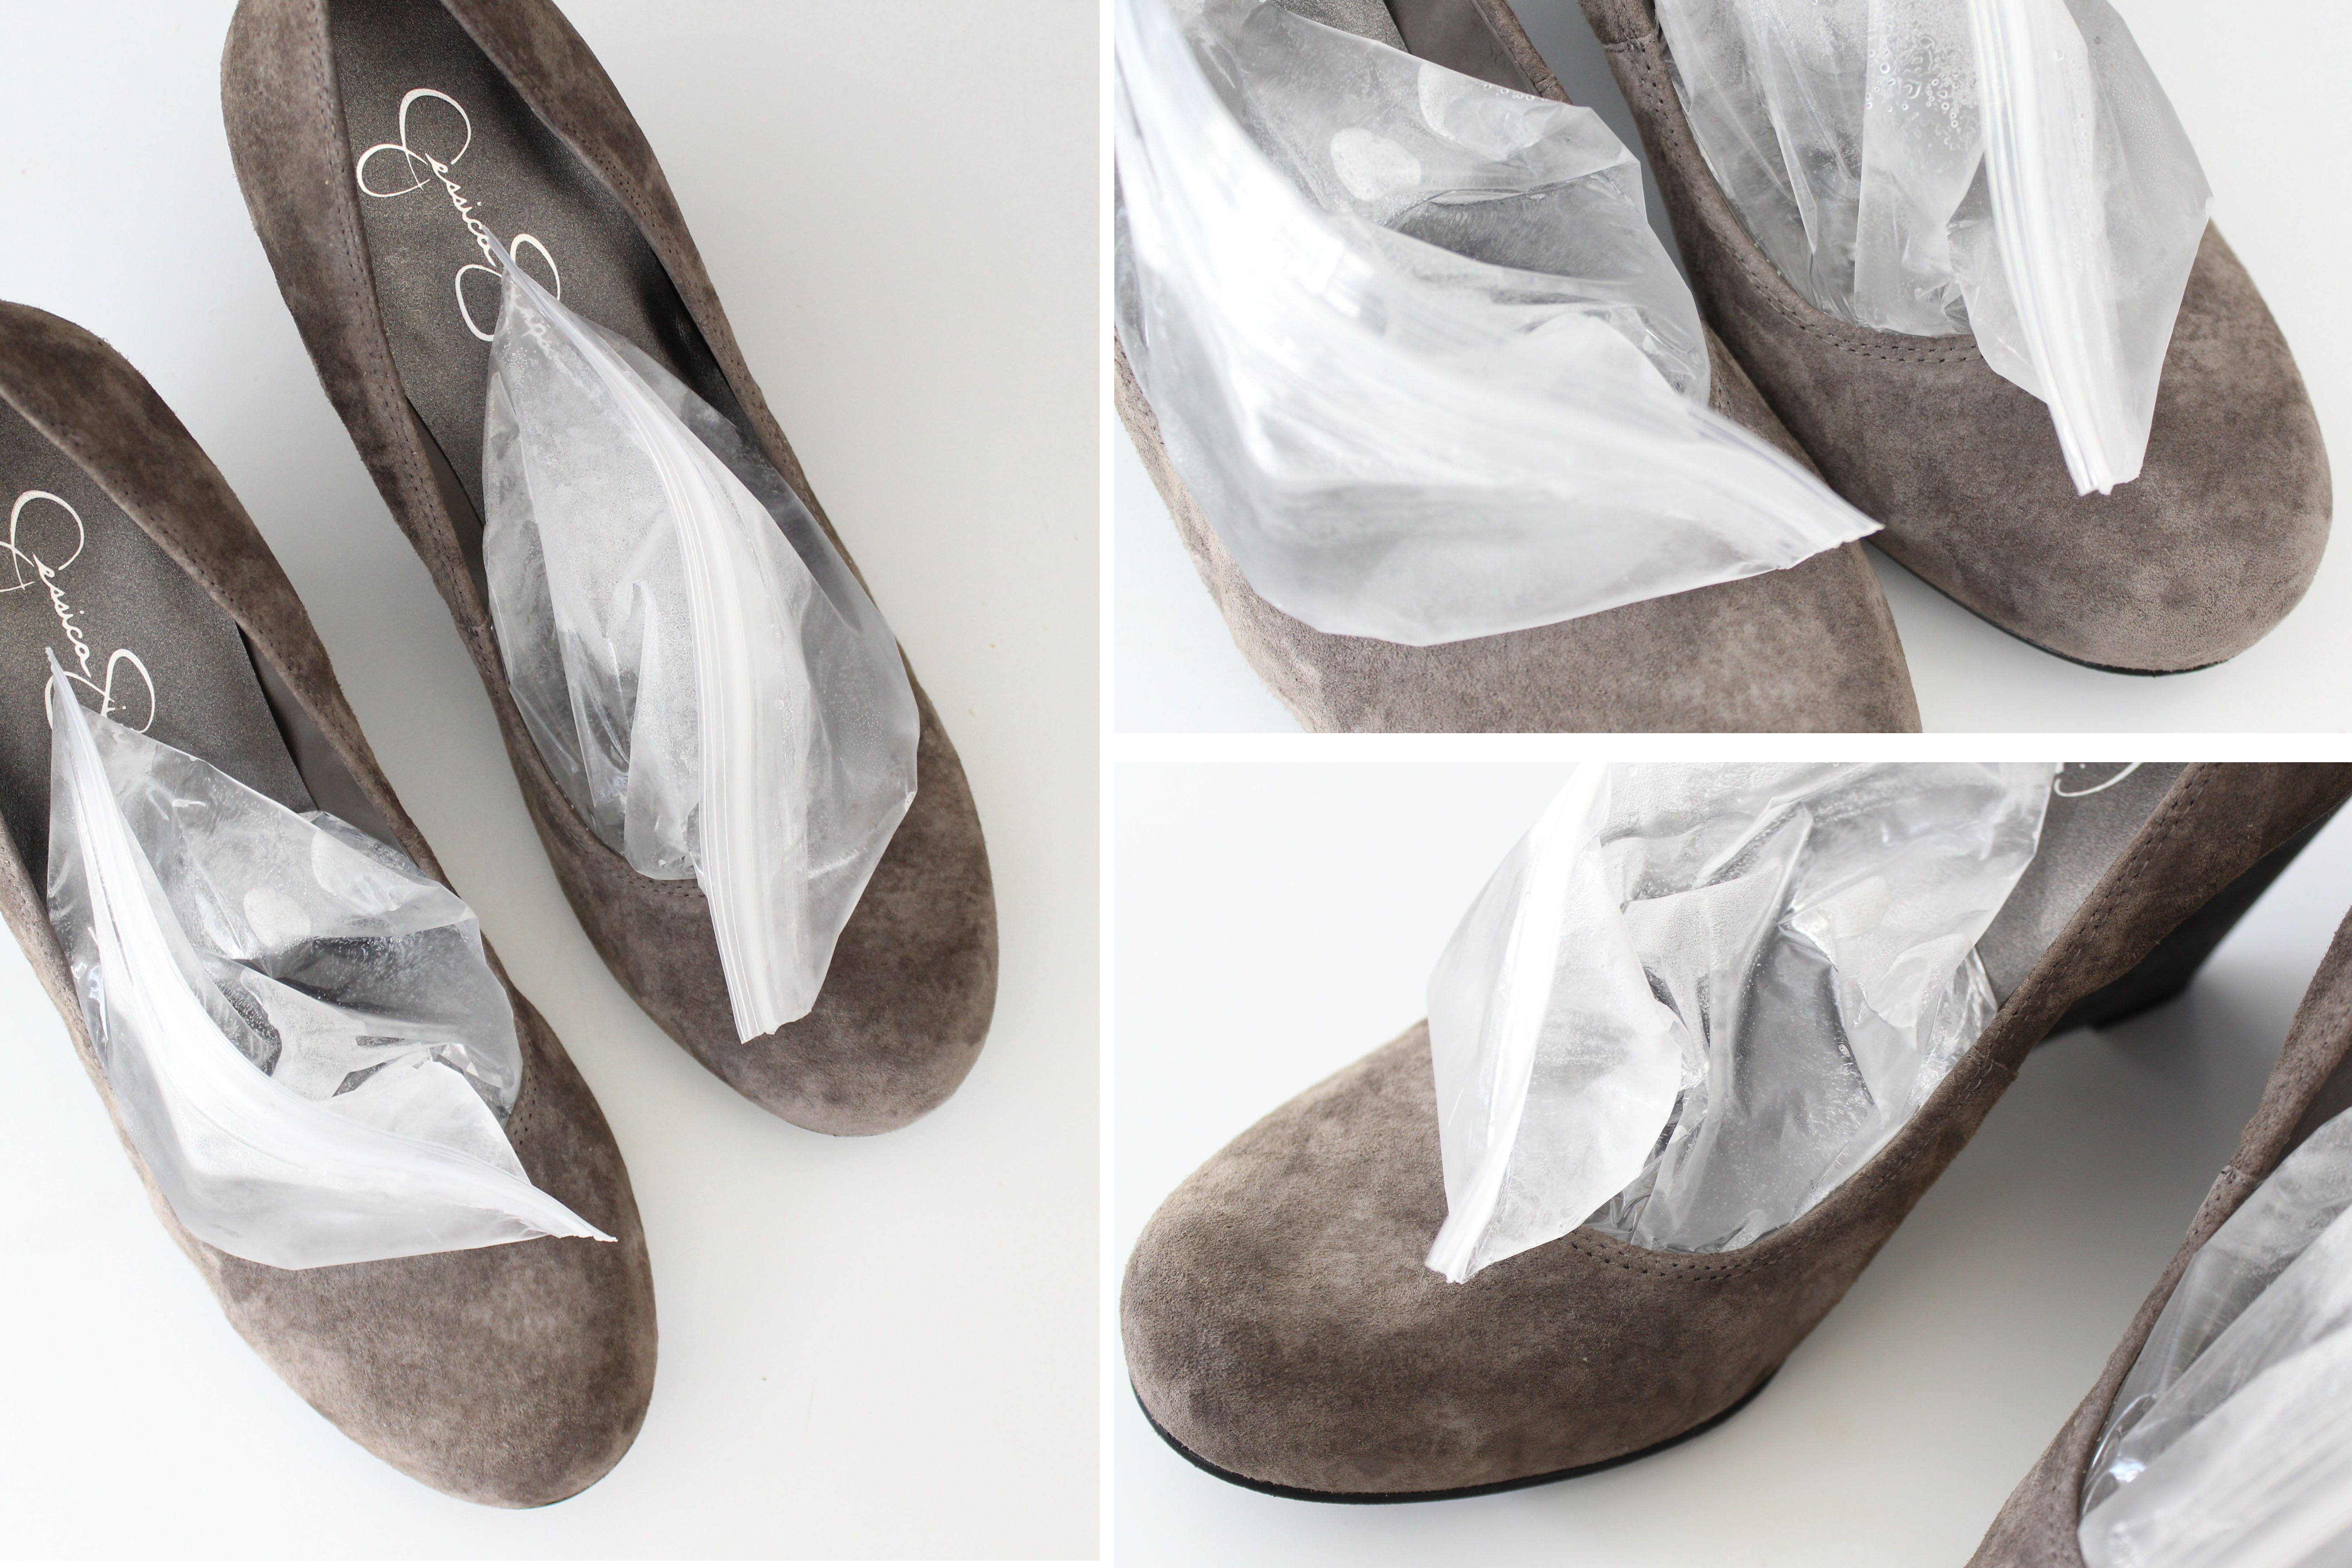 shoes-freezer-01